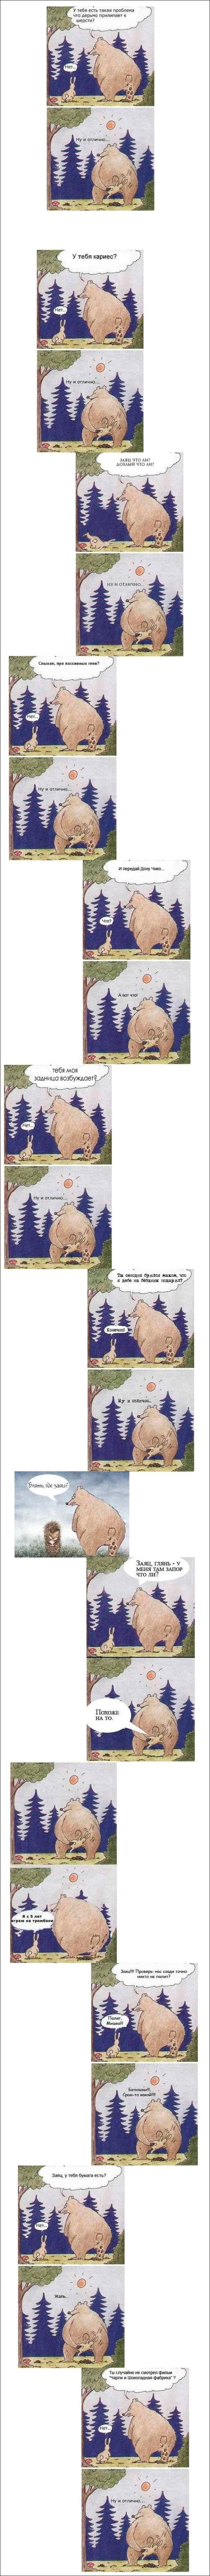 Заяц и медведь